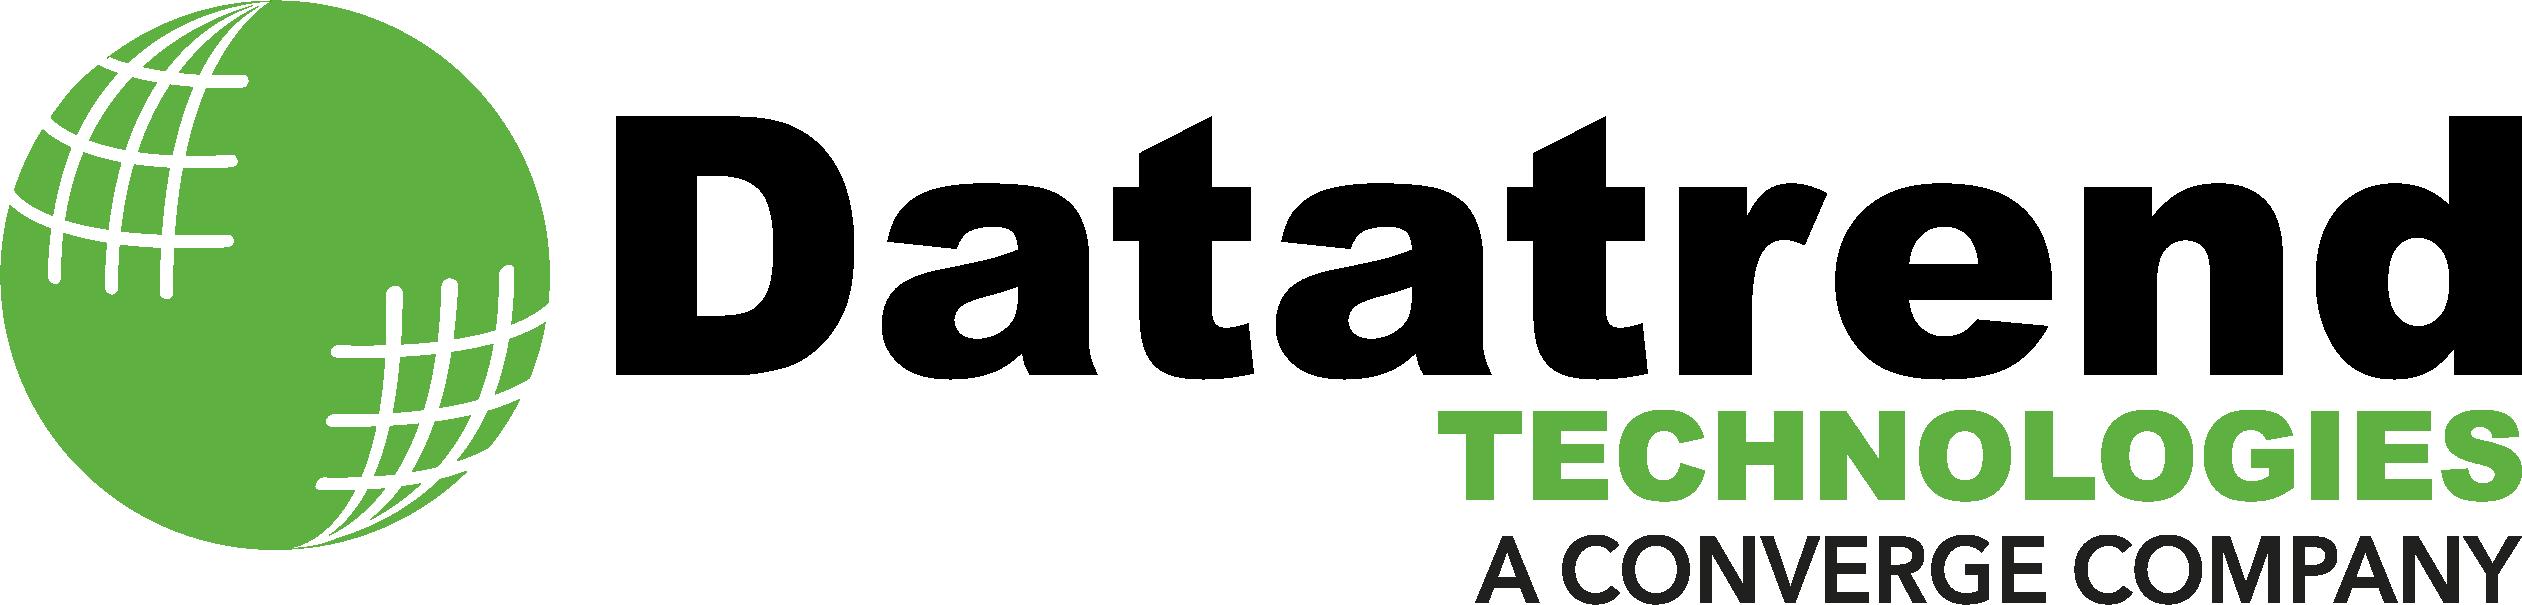 Datatrend Technologies_Main_CTS